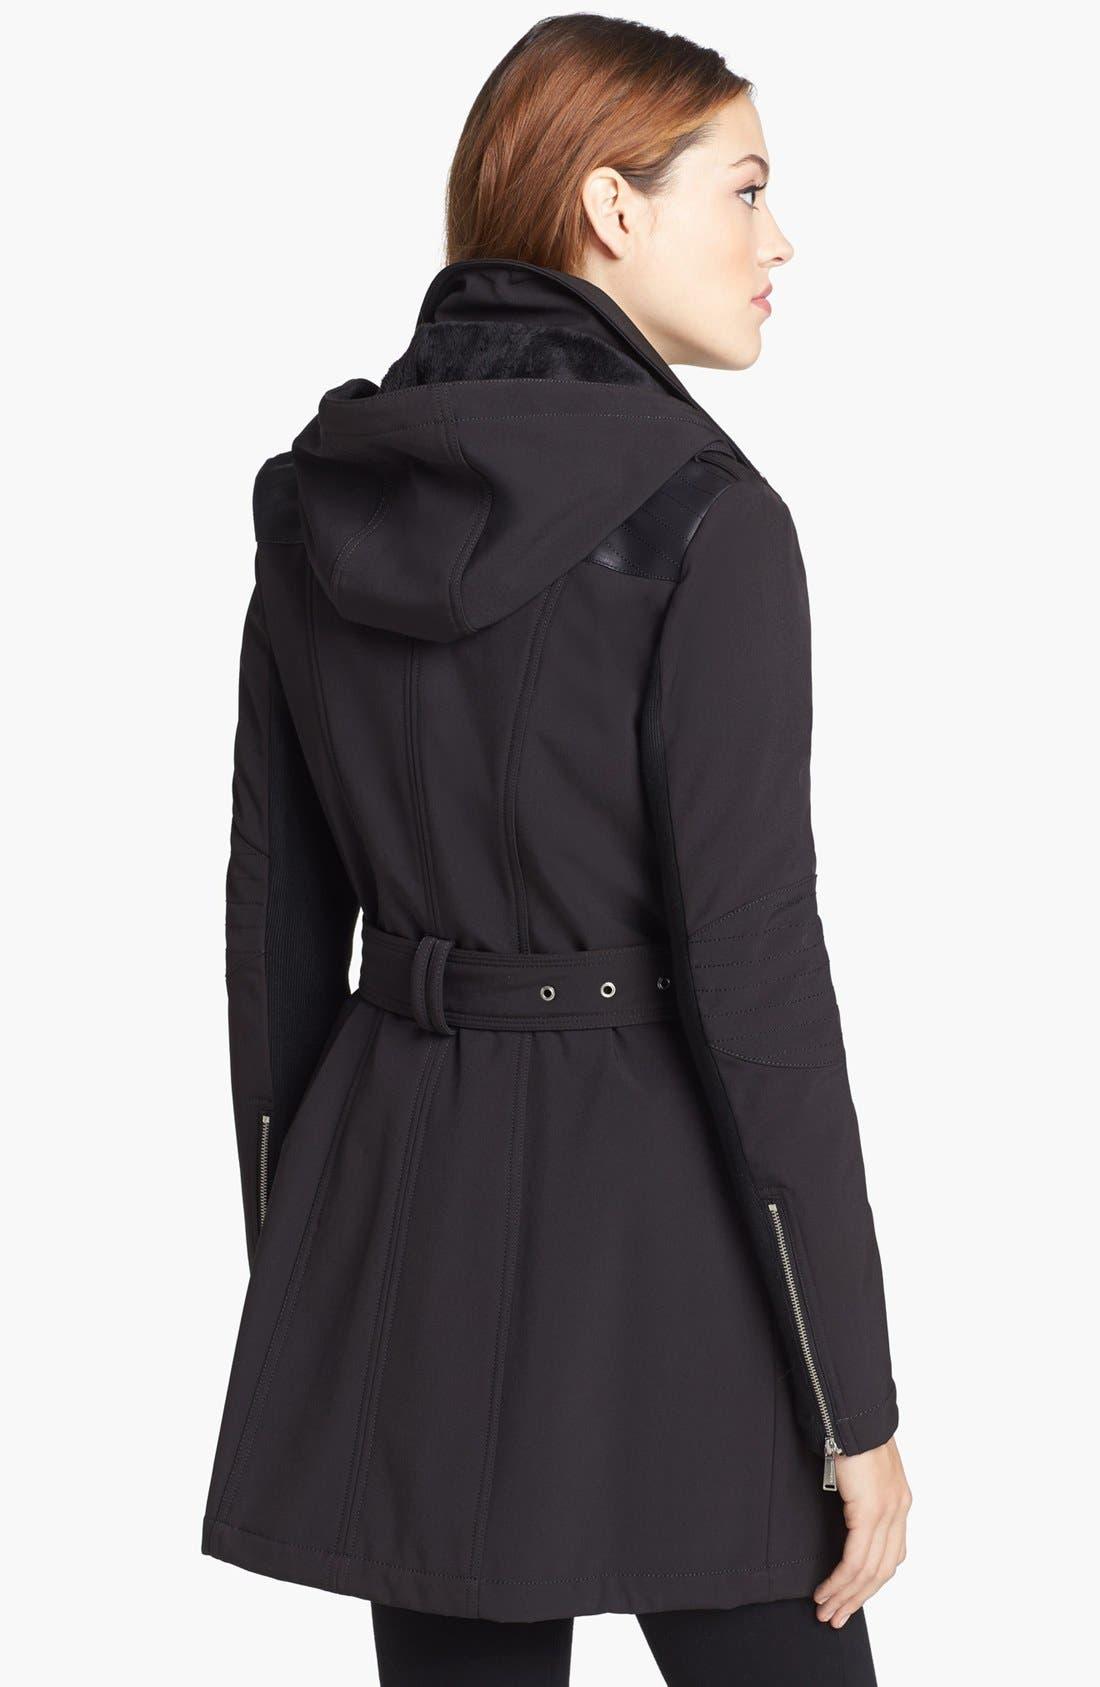 BCBGENERATION, Asymmetrical Belted Softshell Jacket, Alternate thumbnail 4, color, 001